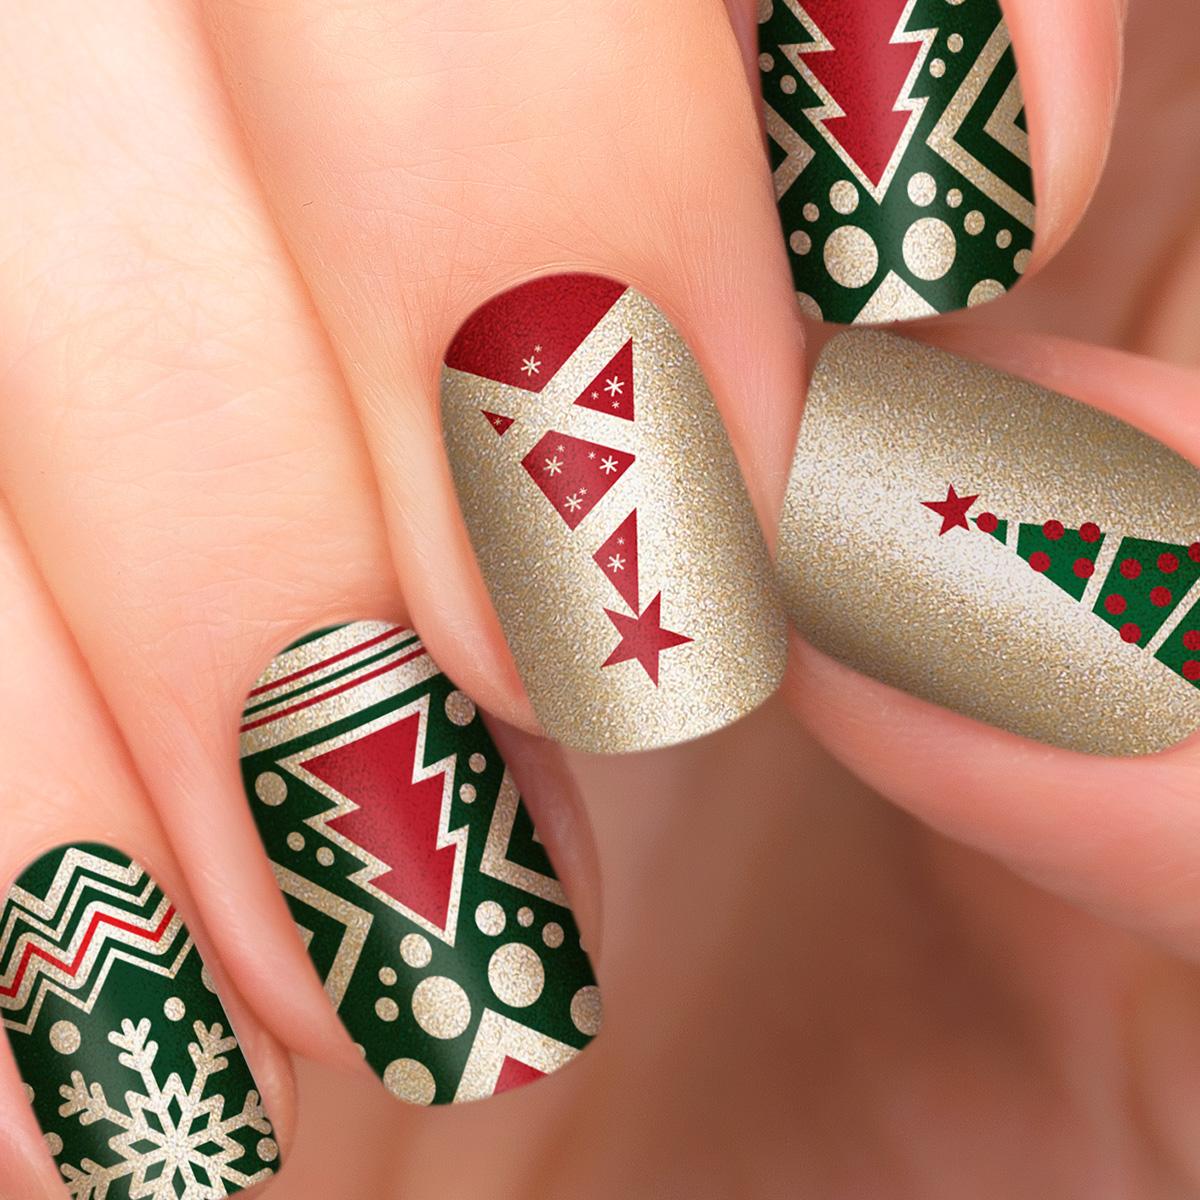 Incoco.com Incoco Nail Polish Strips, Christmas Magic